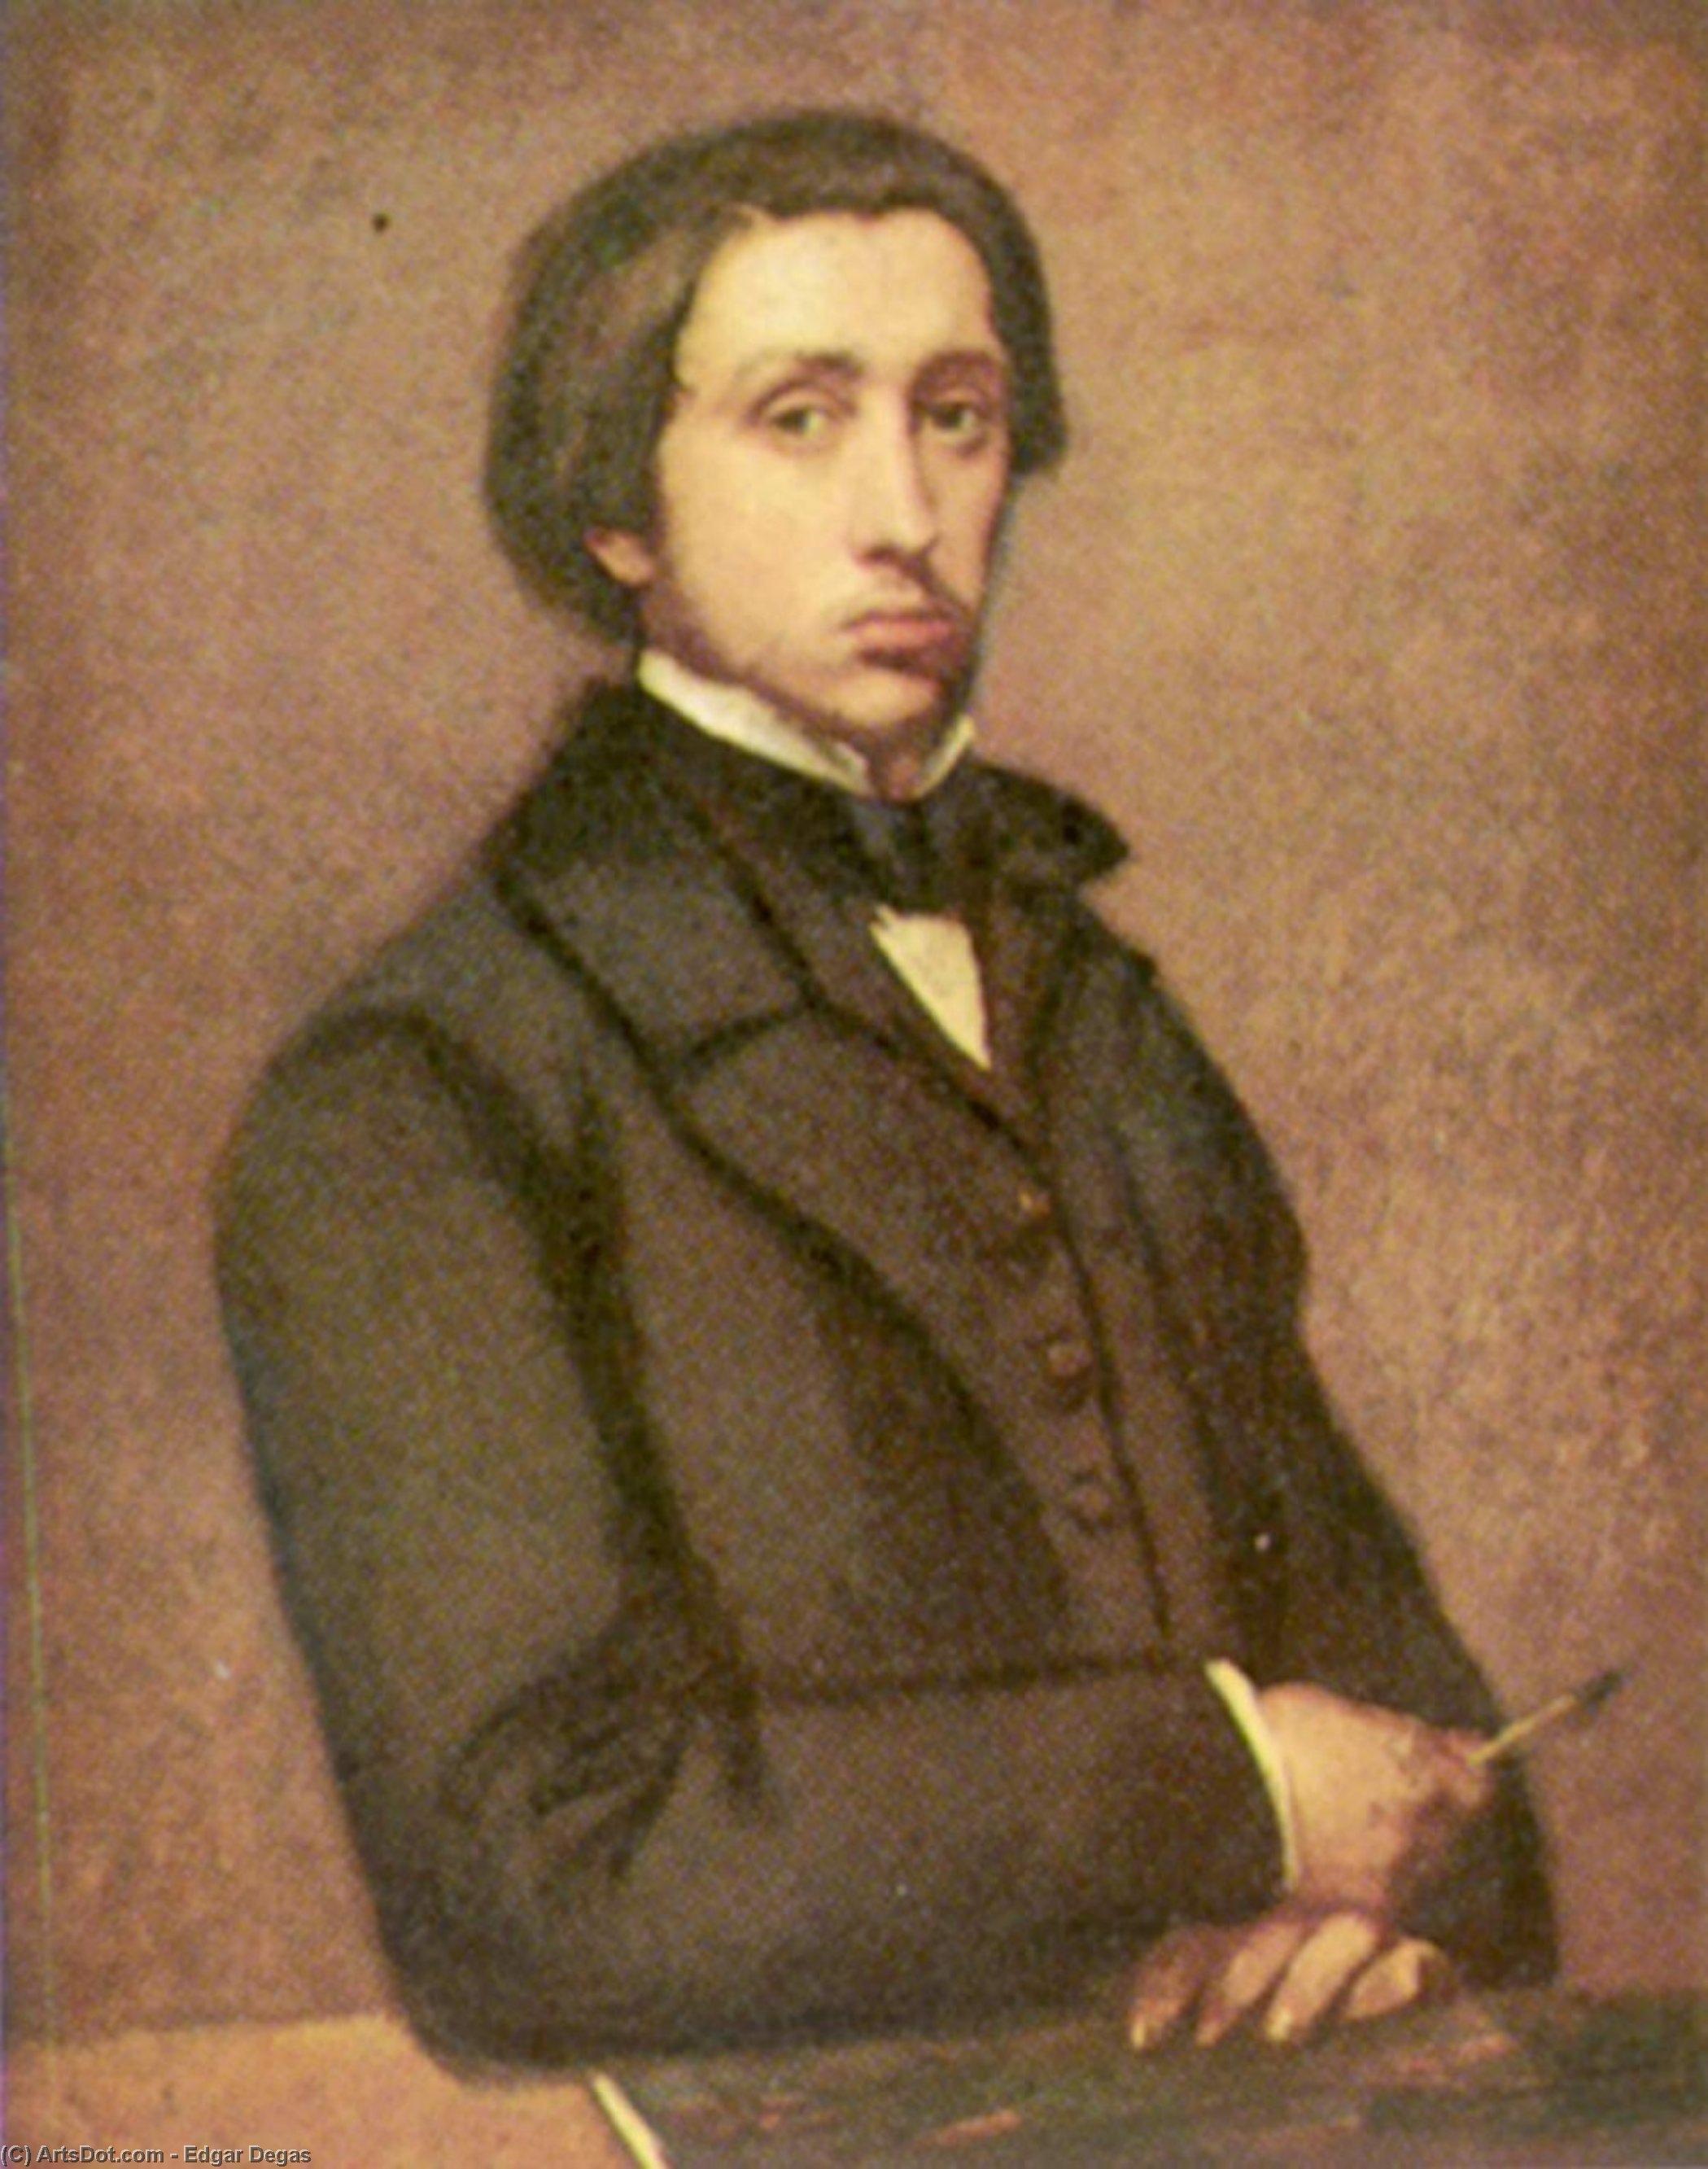 Wikioo.org - The Encyclopedia of Fine Arts - Painting, Artwork by Edgar Degas - Self-portrait